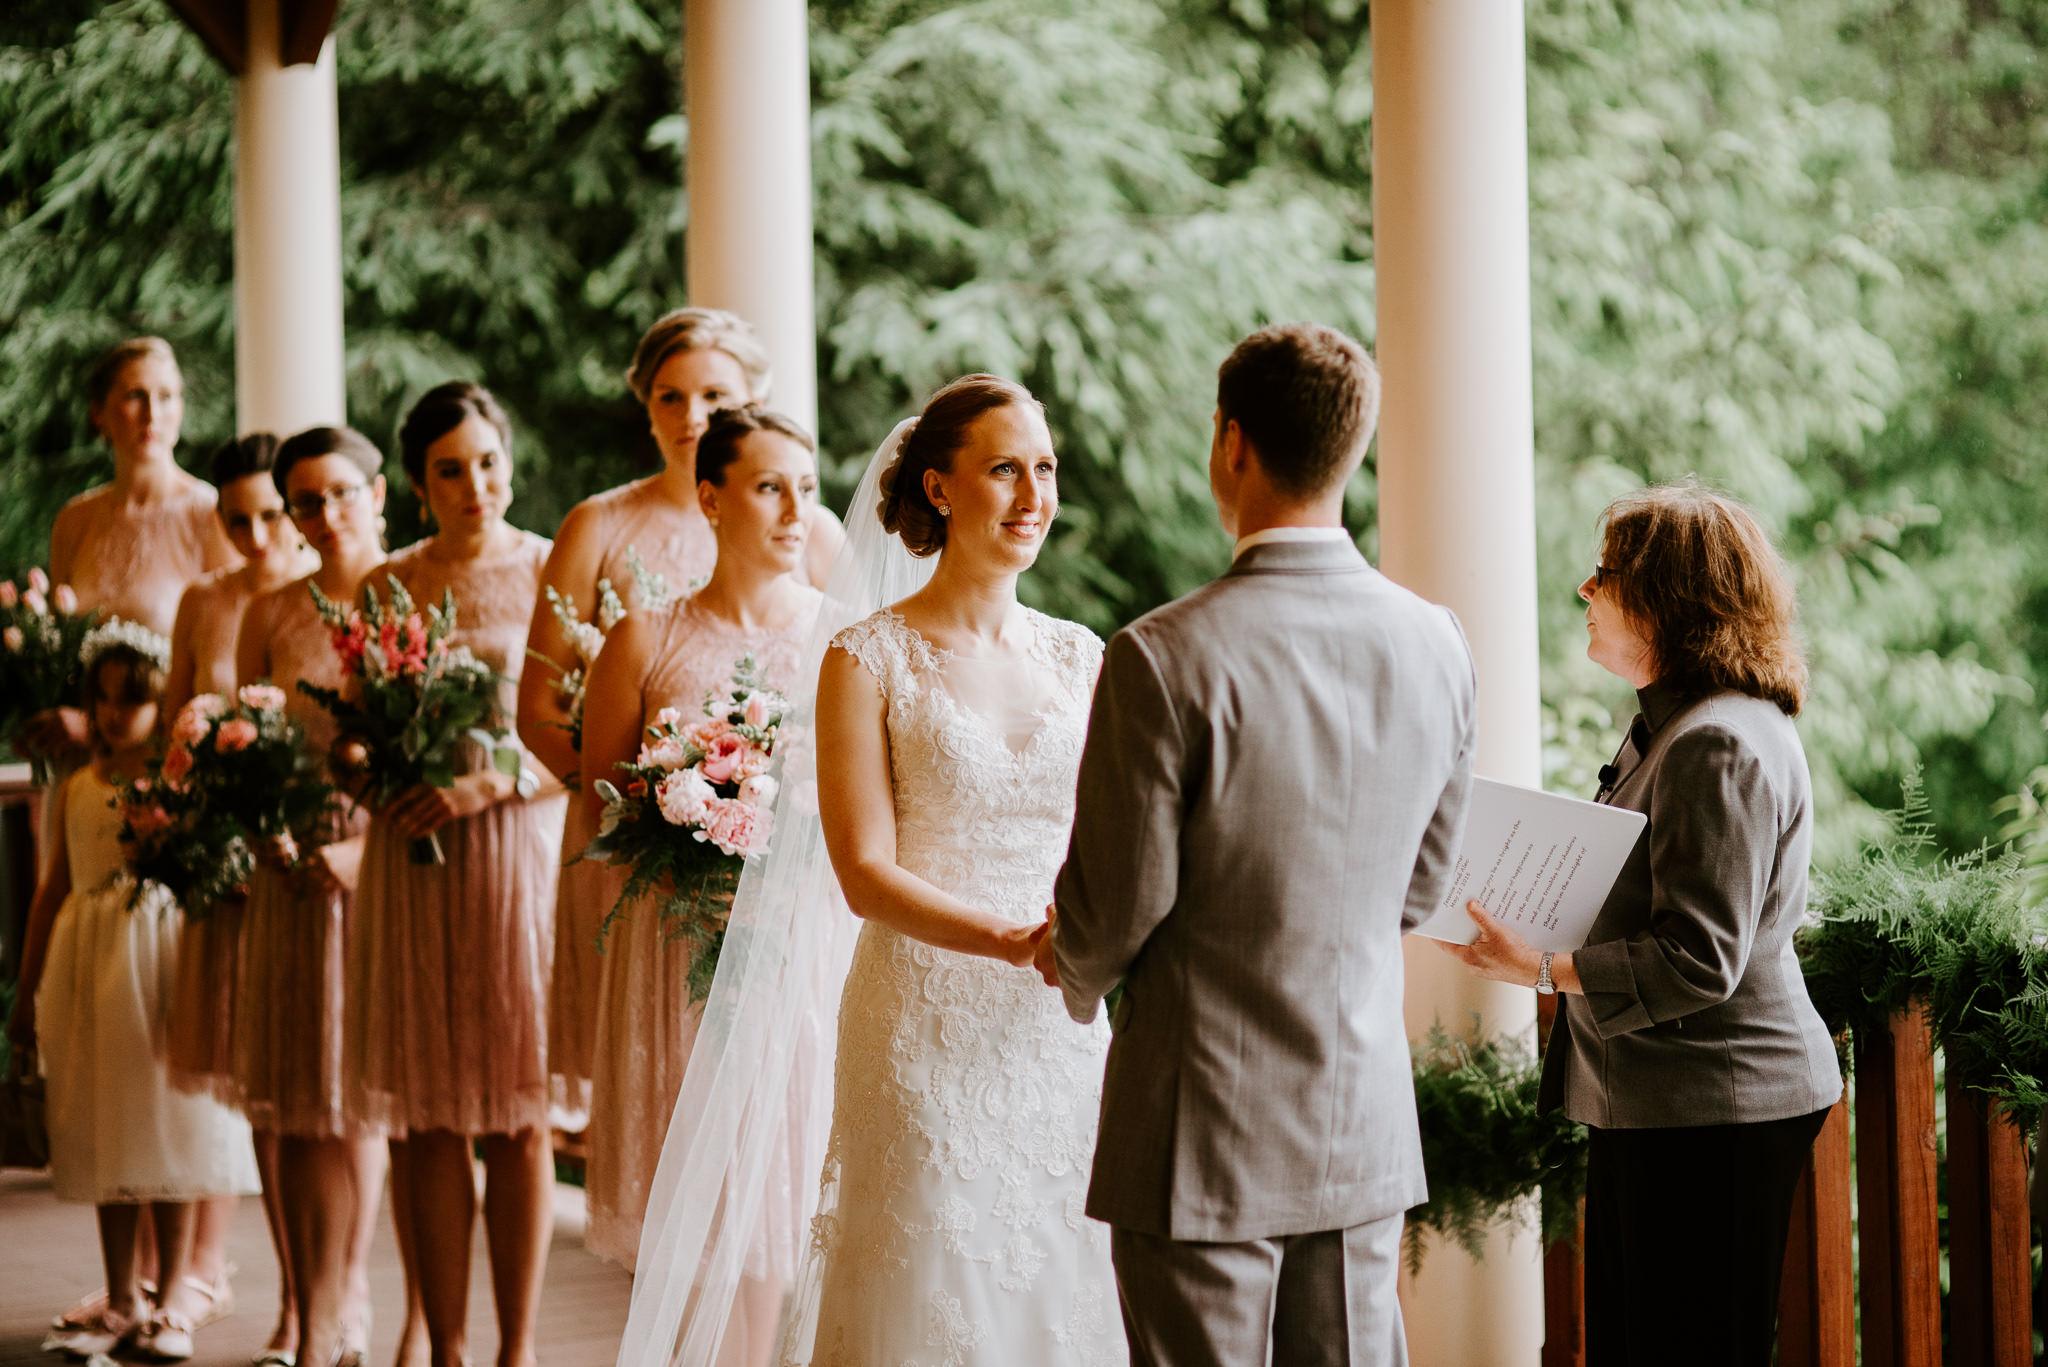 House Mountain Inn - Weddings - Lexington - Virginia - Best Wedding Photographer - Pat Cori Photography-60.jpg